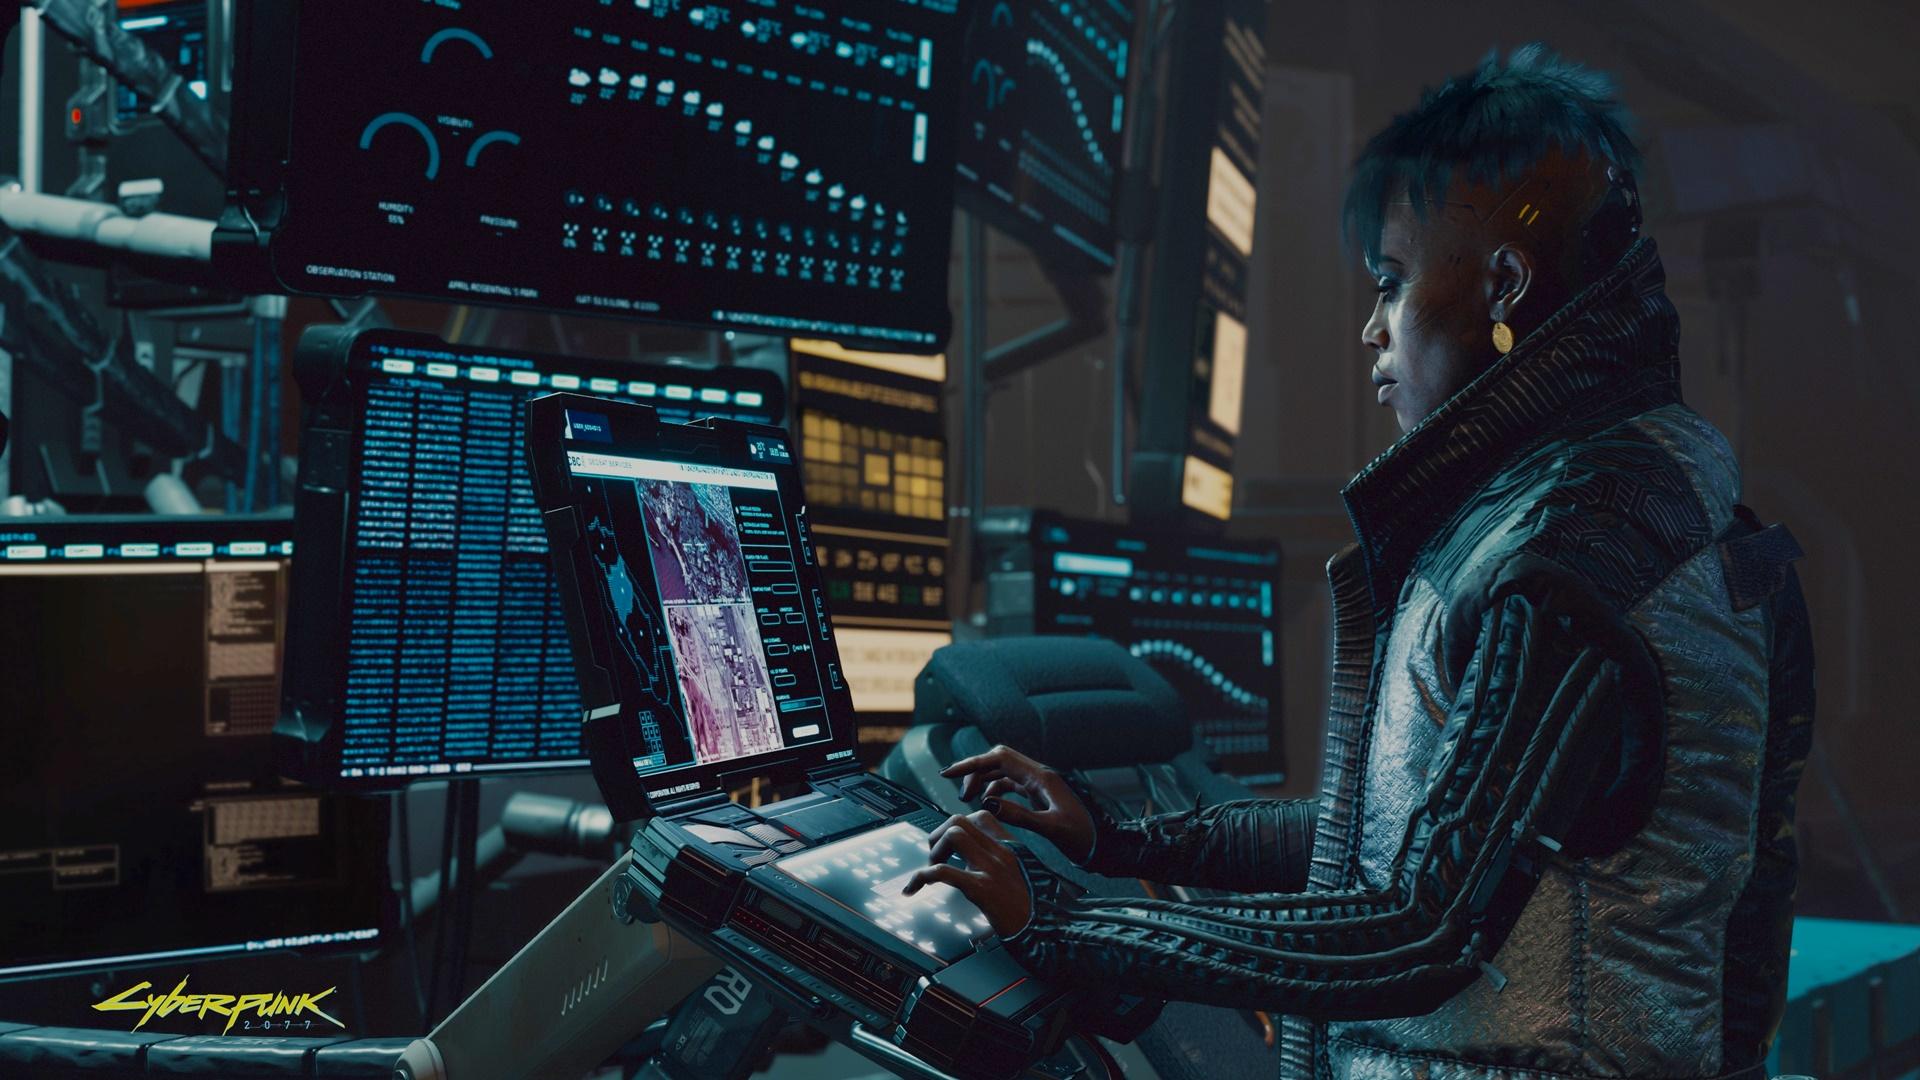 cyberpunk techie